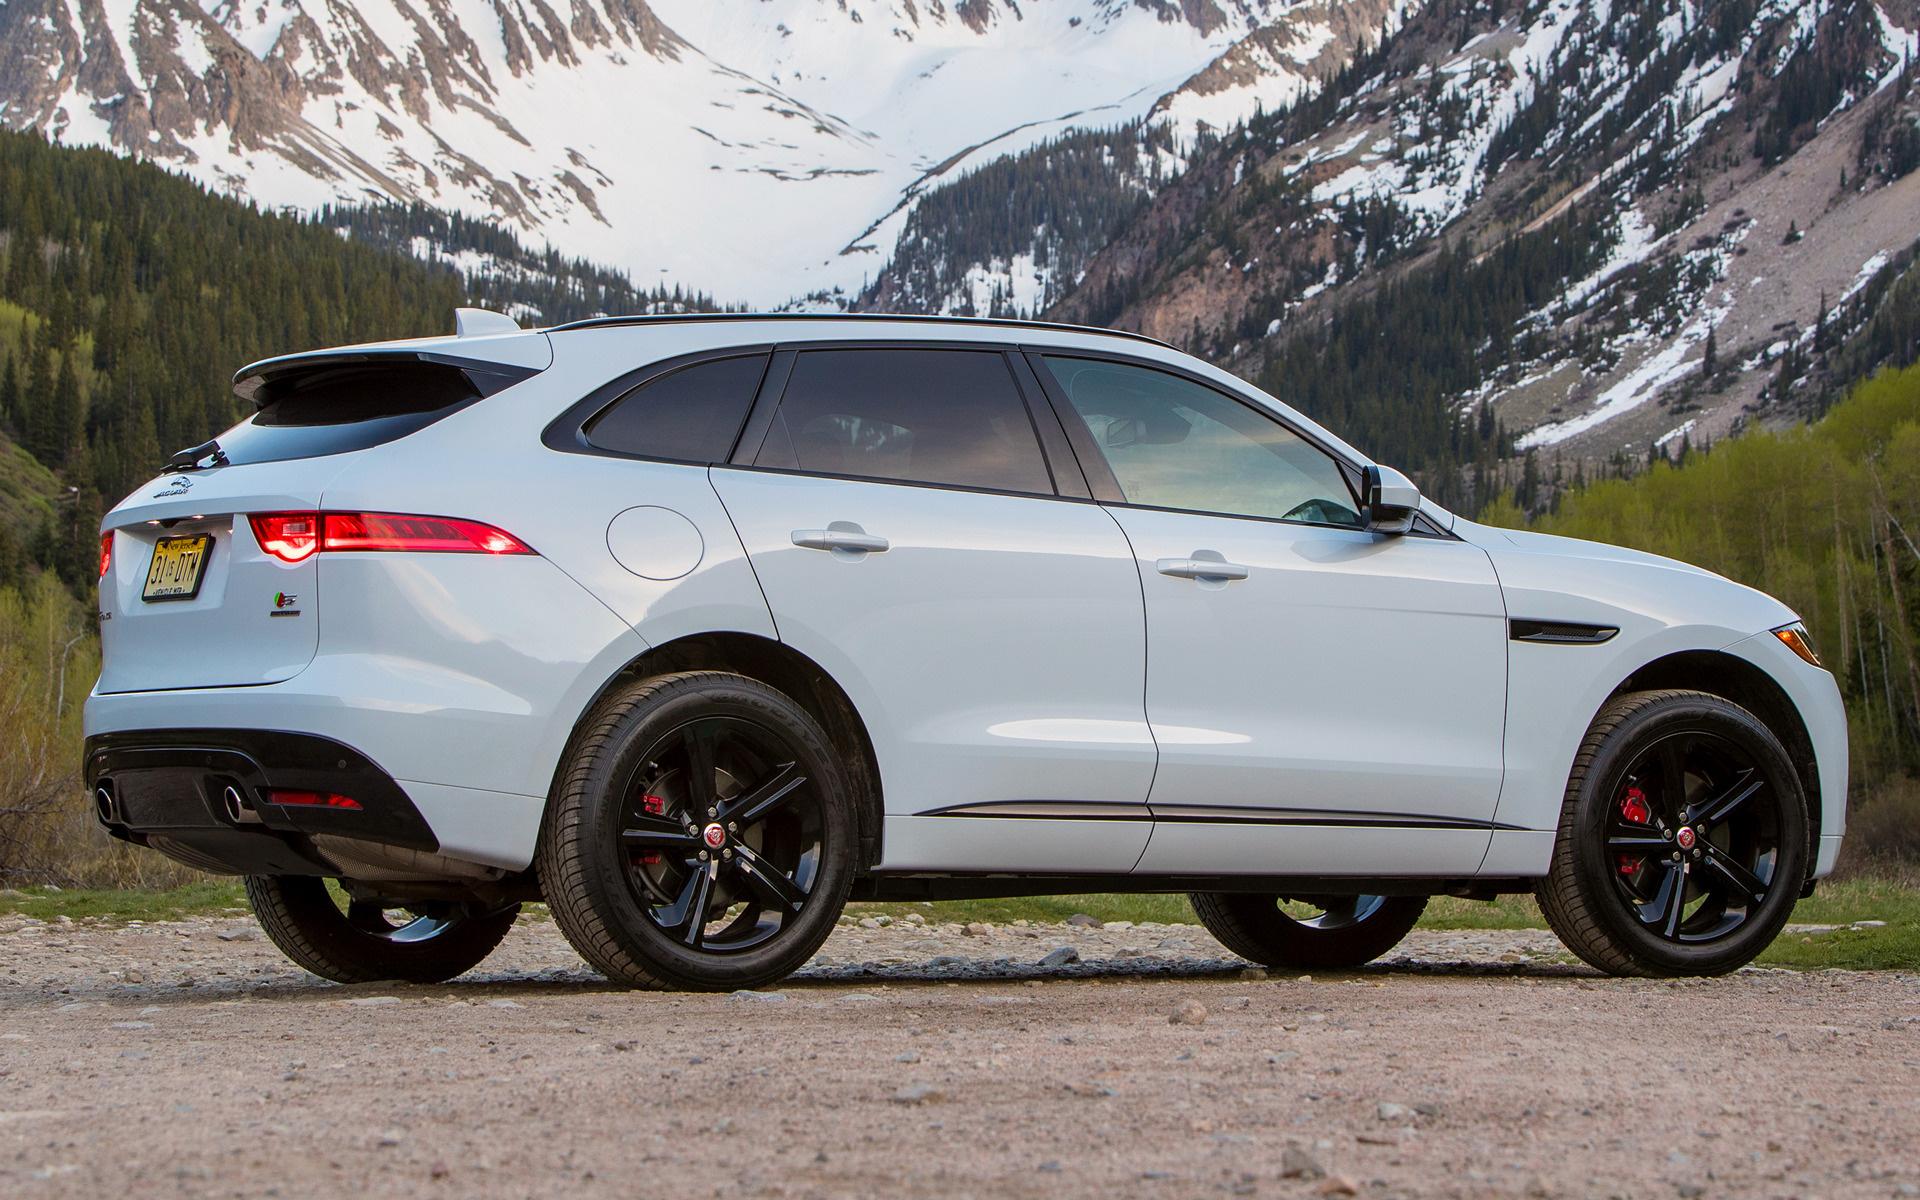 Jaguar F-Pace S (2017) US Wallpapers and HD Images - Car Pixel